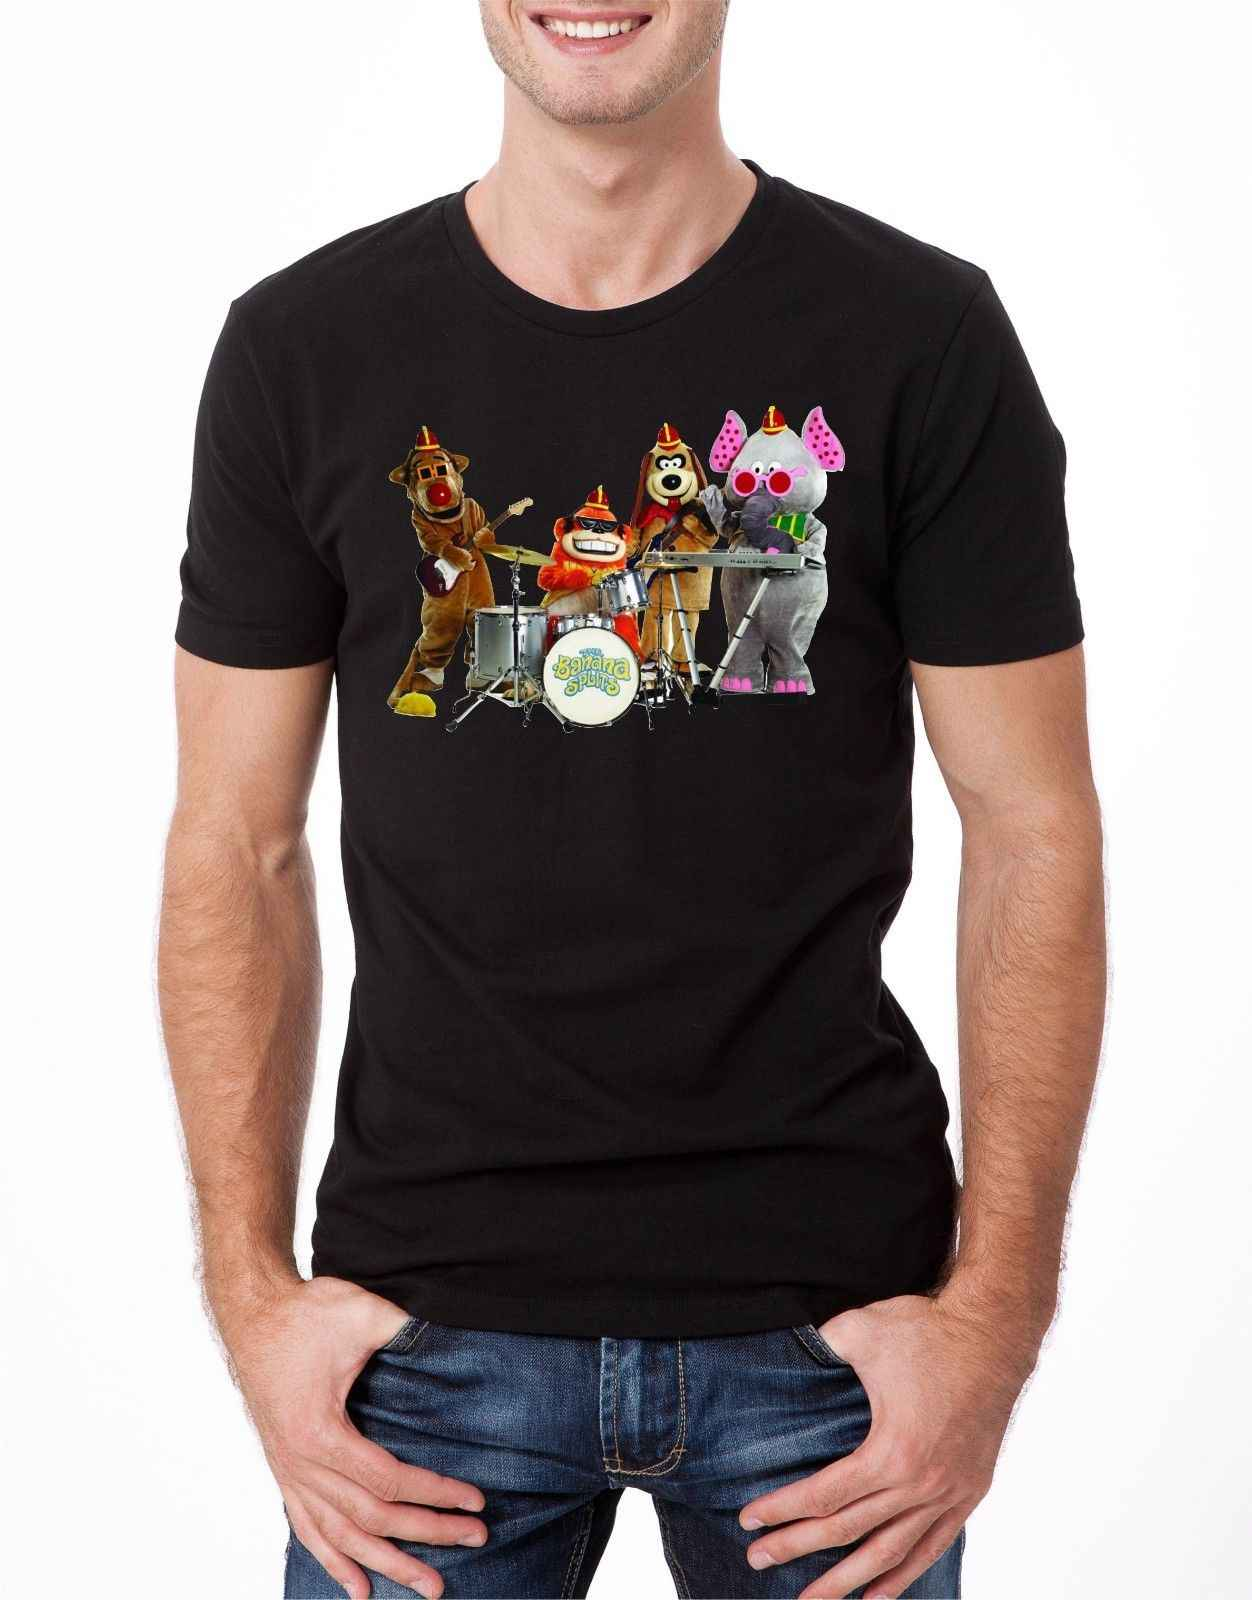 Banaan Splits T-SHIRT Cartoon Kids 80 s 90 s TV Vintage Movie Film Retro Mens BLA Cartoon t-shirt mannen unisex Nieuwe Mode tshirt